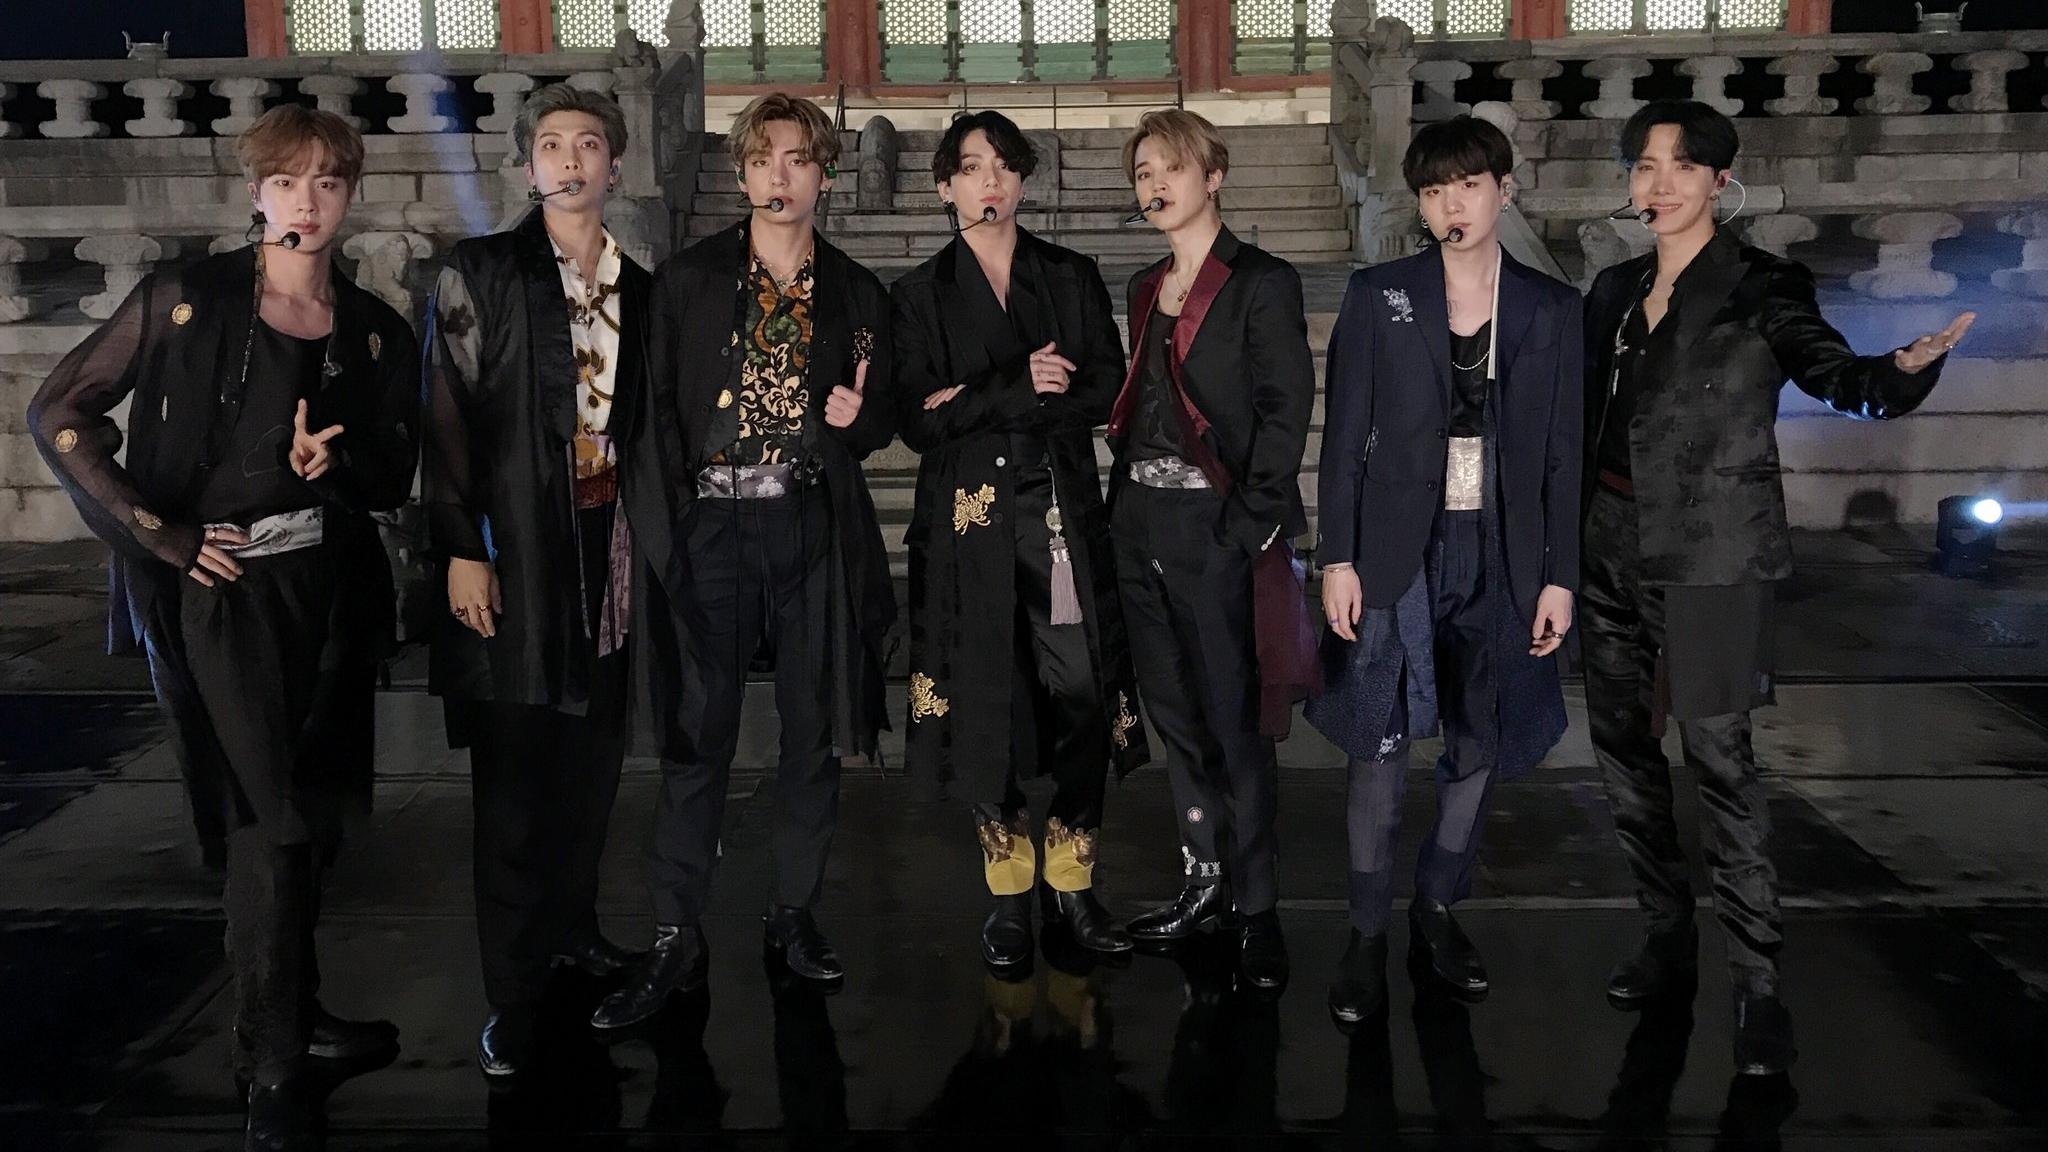 BTS Docufilm 'Break the Silence' Arrives in SM Cinemas This October